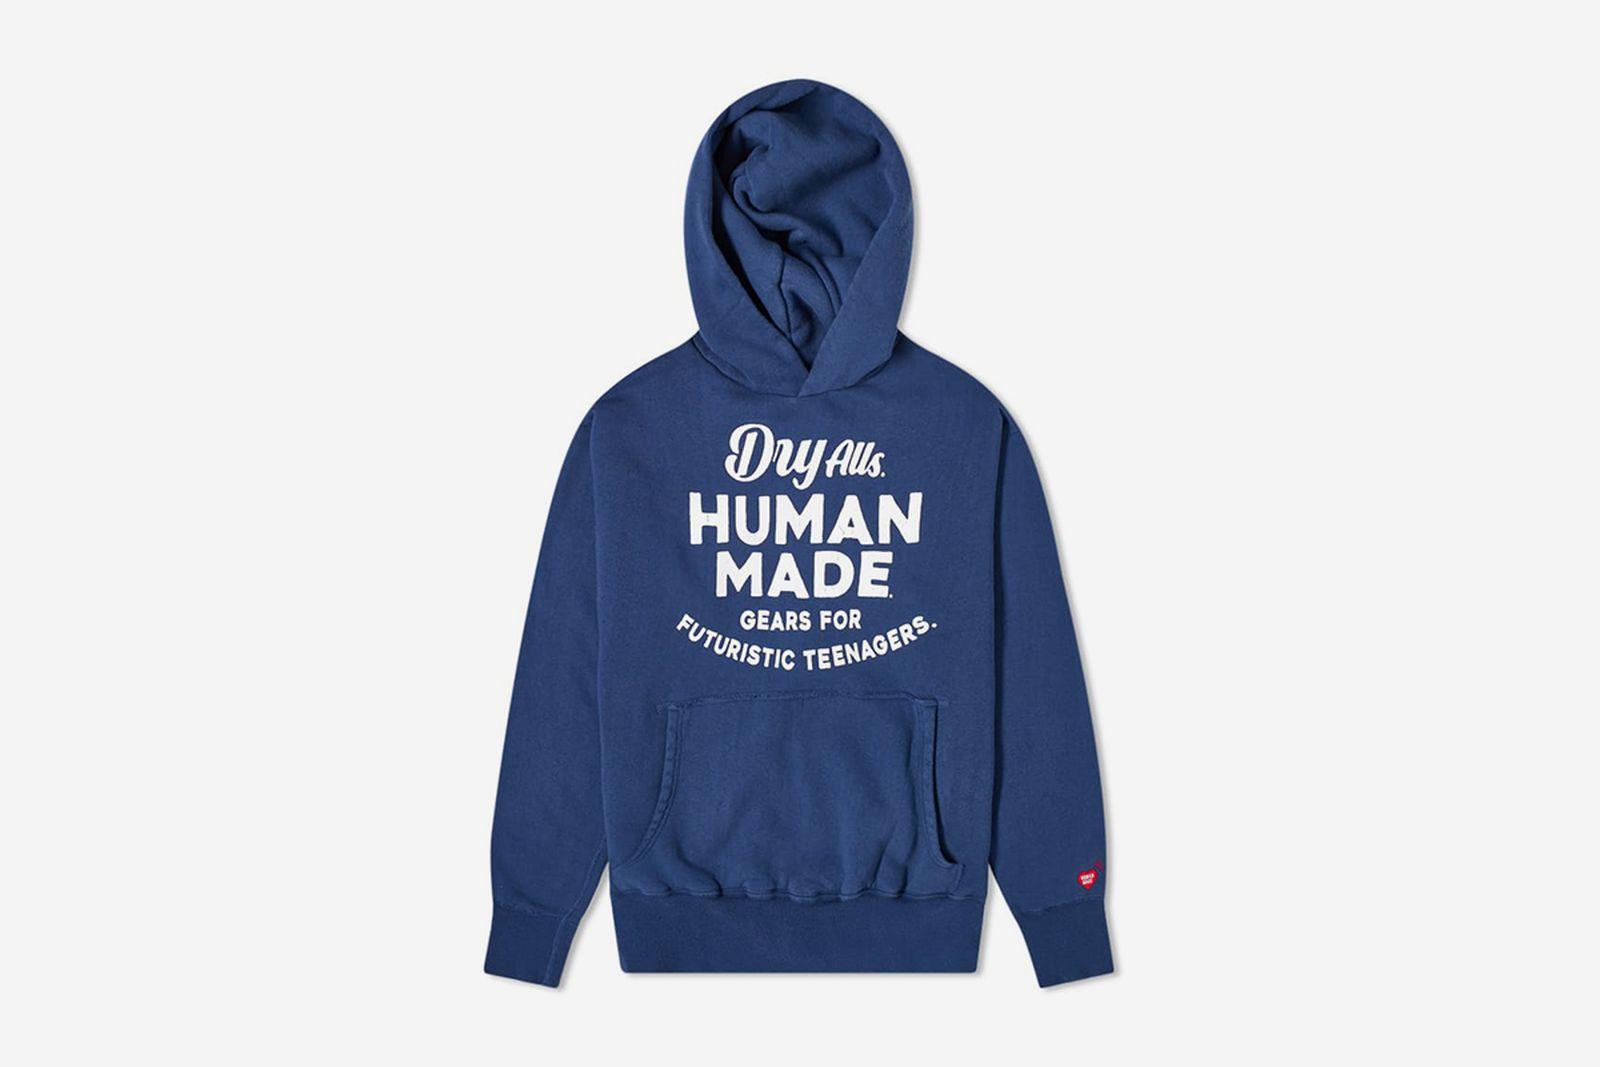 01-02-2020_humanmade_hoodedsweat_navy_hm19cs005-nvy_ja_1